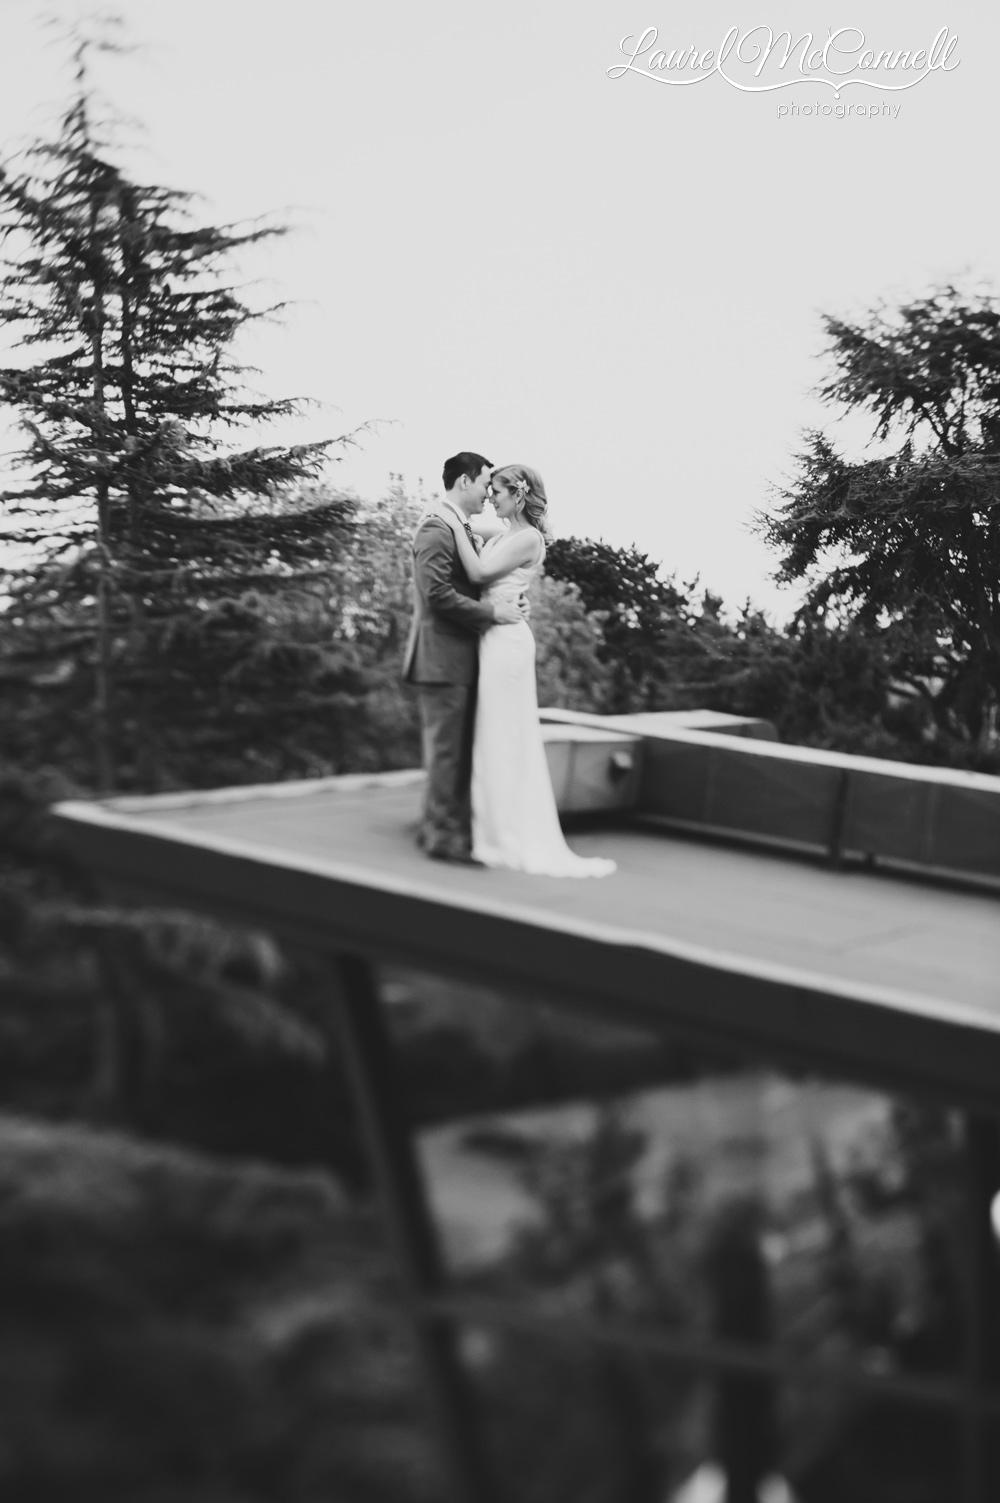 Urban, Pacific Northwest wedding venue Canlis restaurant in Seattle, Washington.